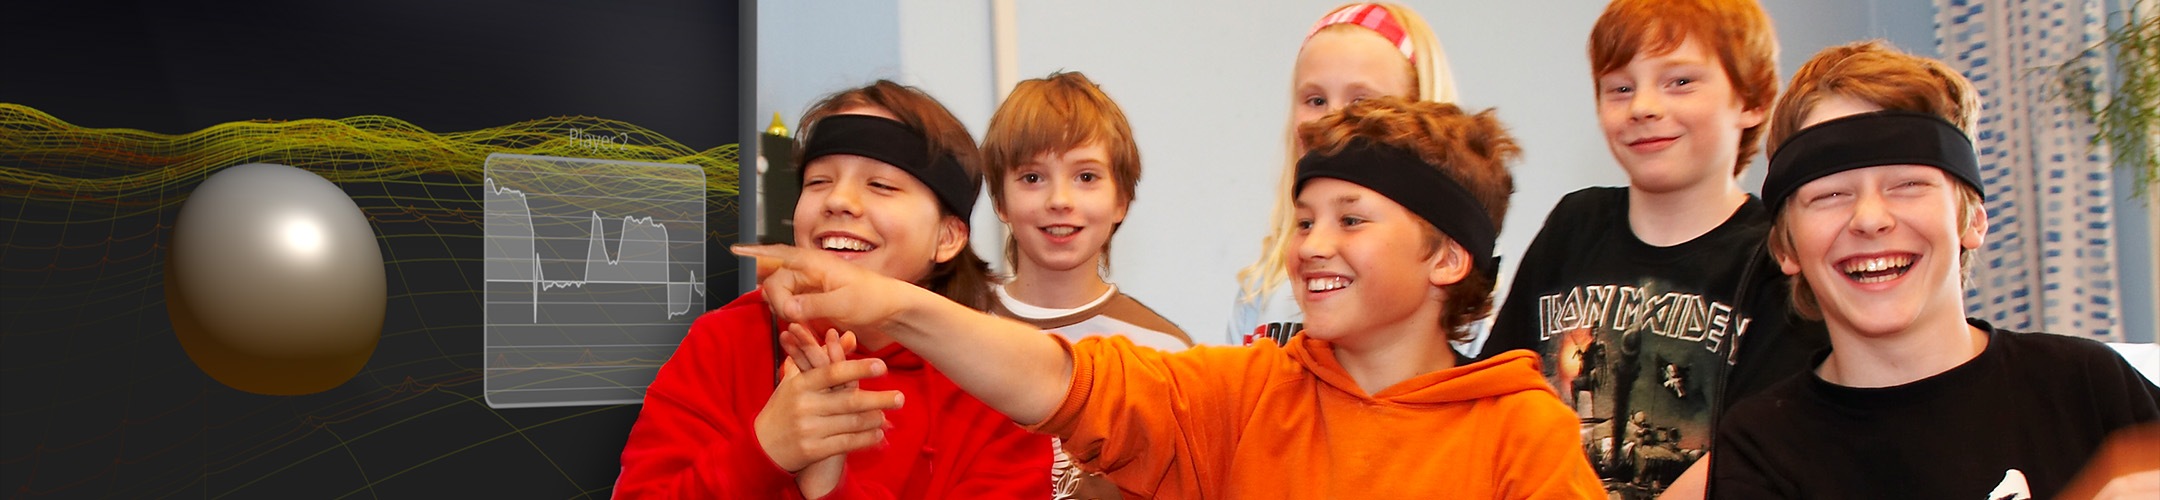 mindball-game-school-children-play-press-2160x500